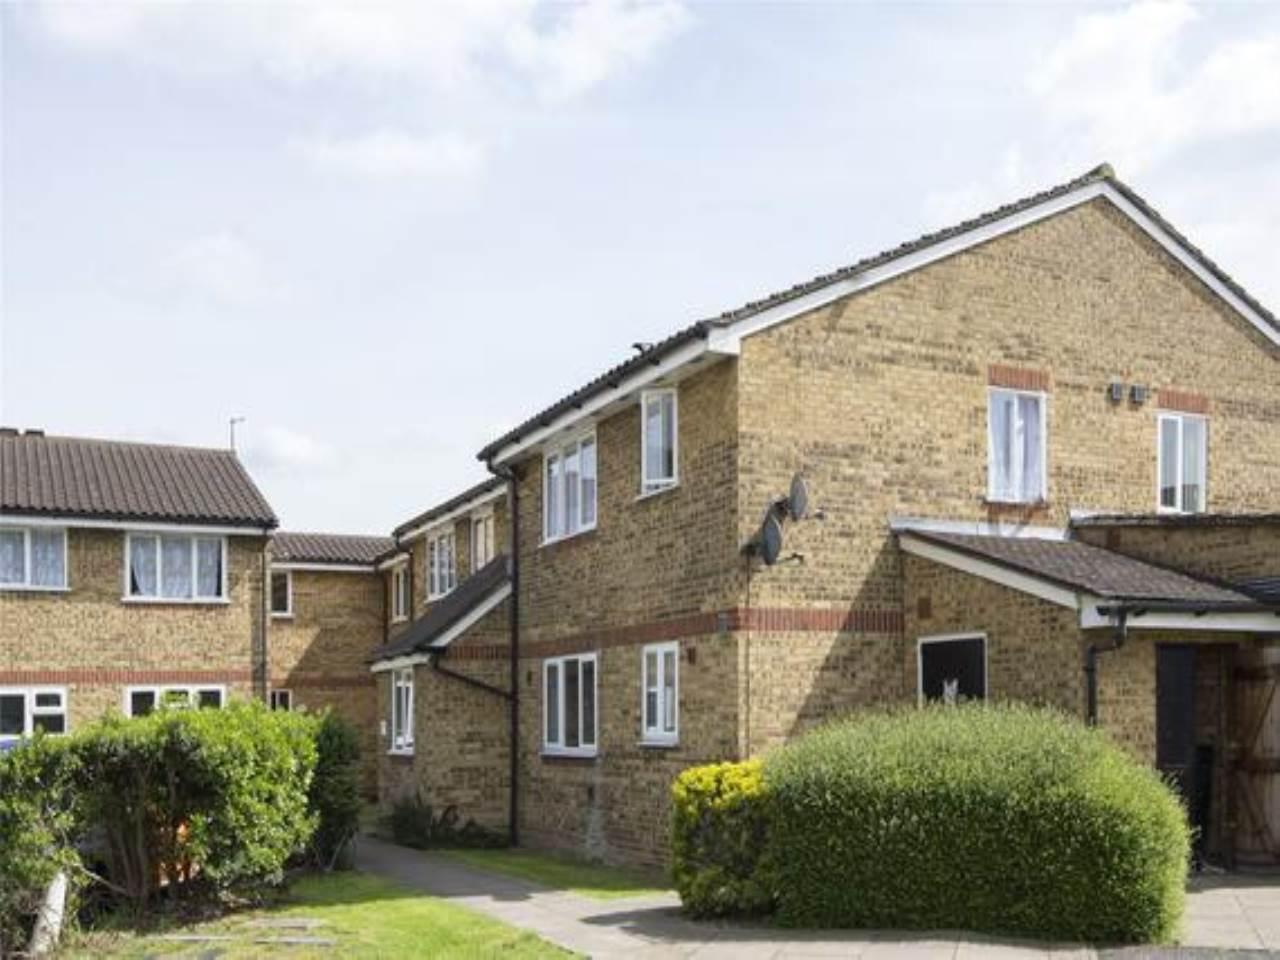 1 bed studio flat to rent in Yunus Khan Close, Walthamstow, E17